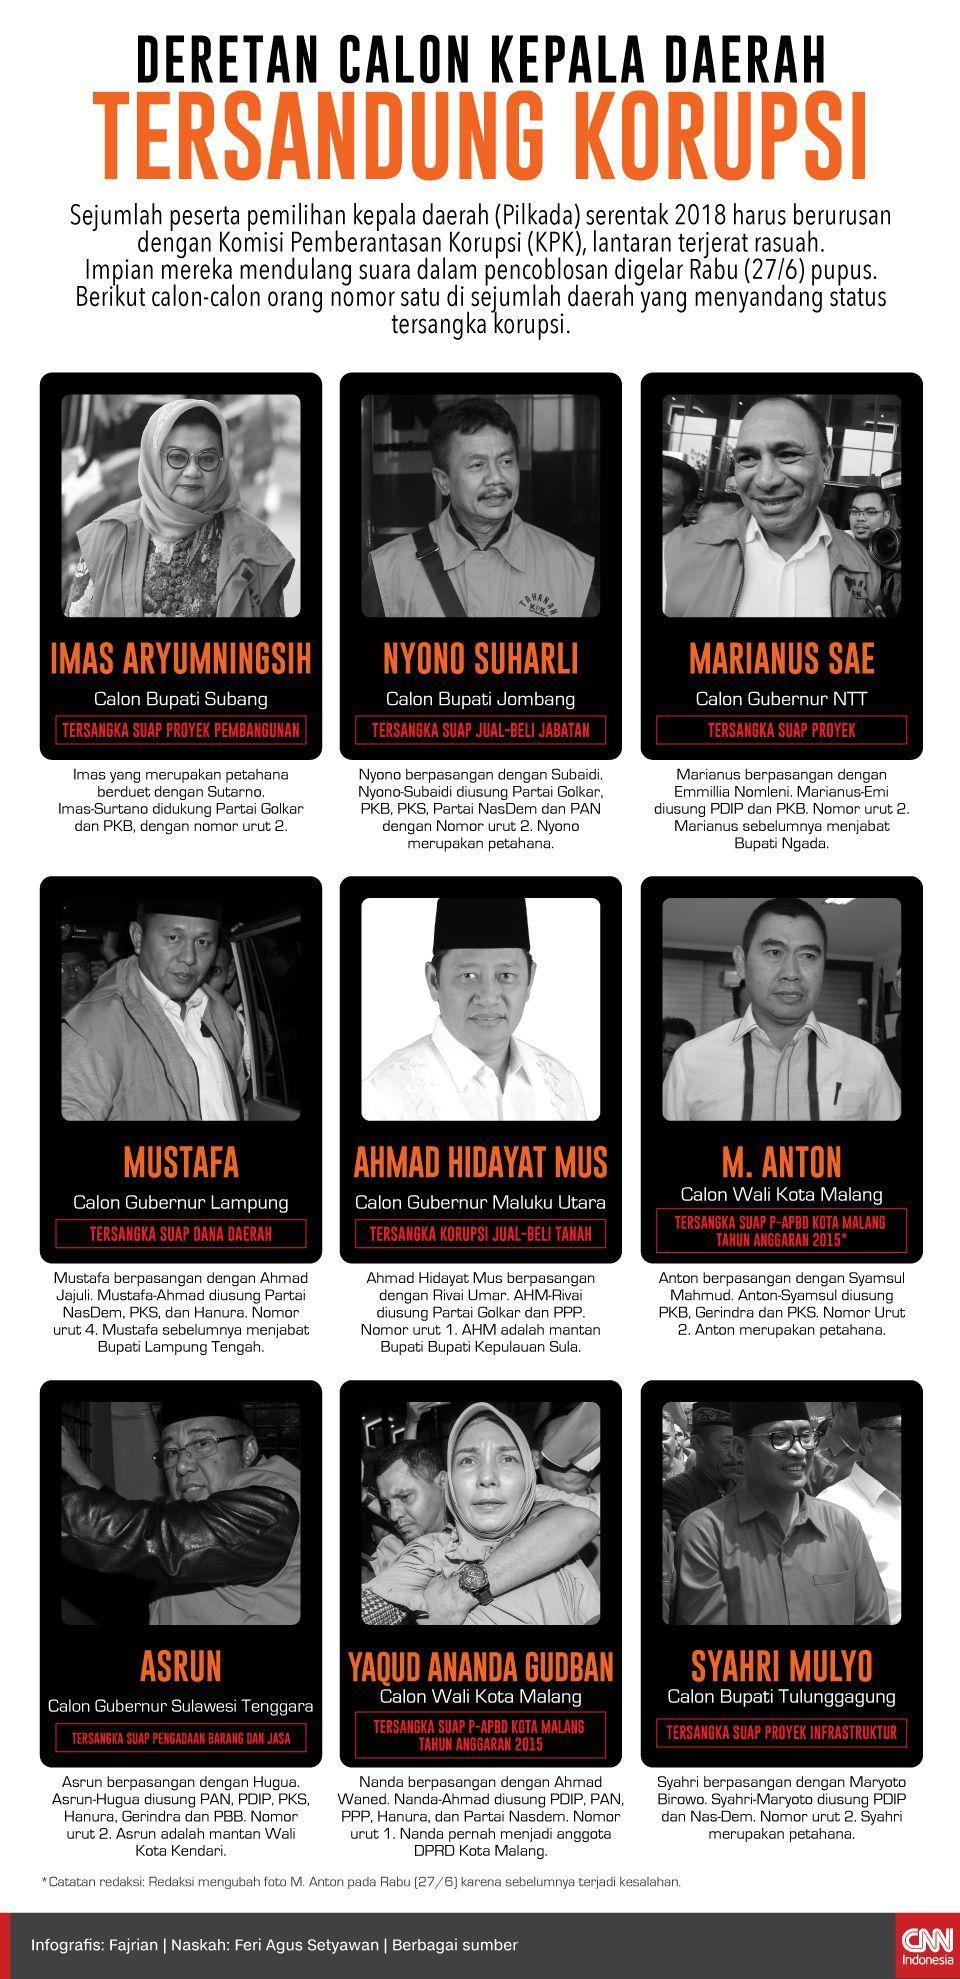 Infografis Deretan Calon Kepala Daerah